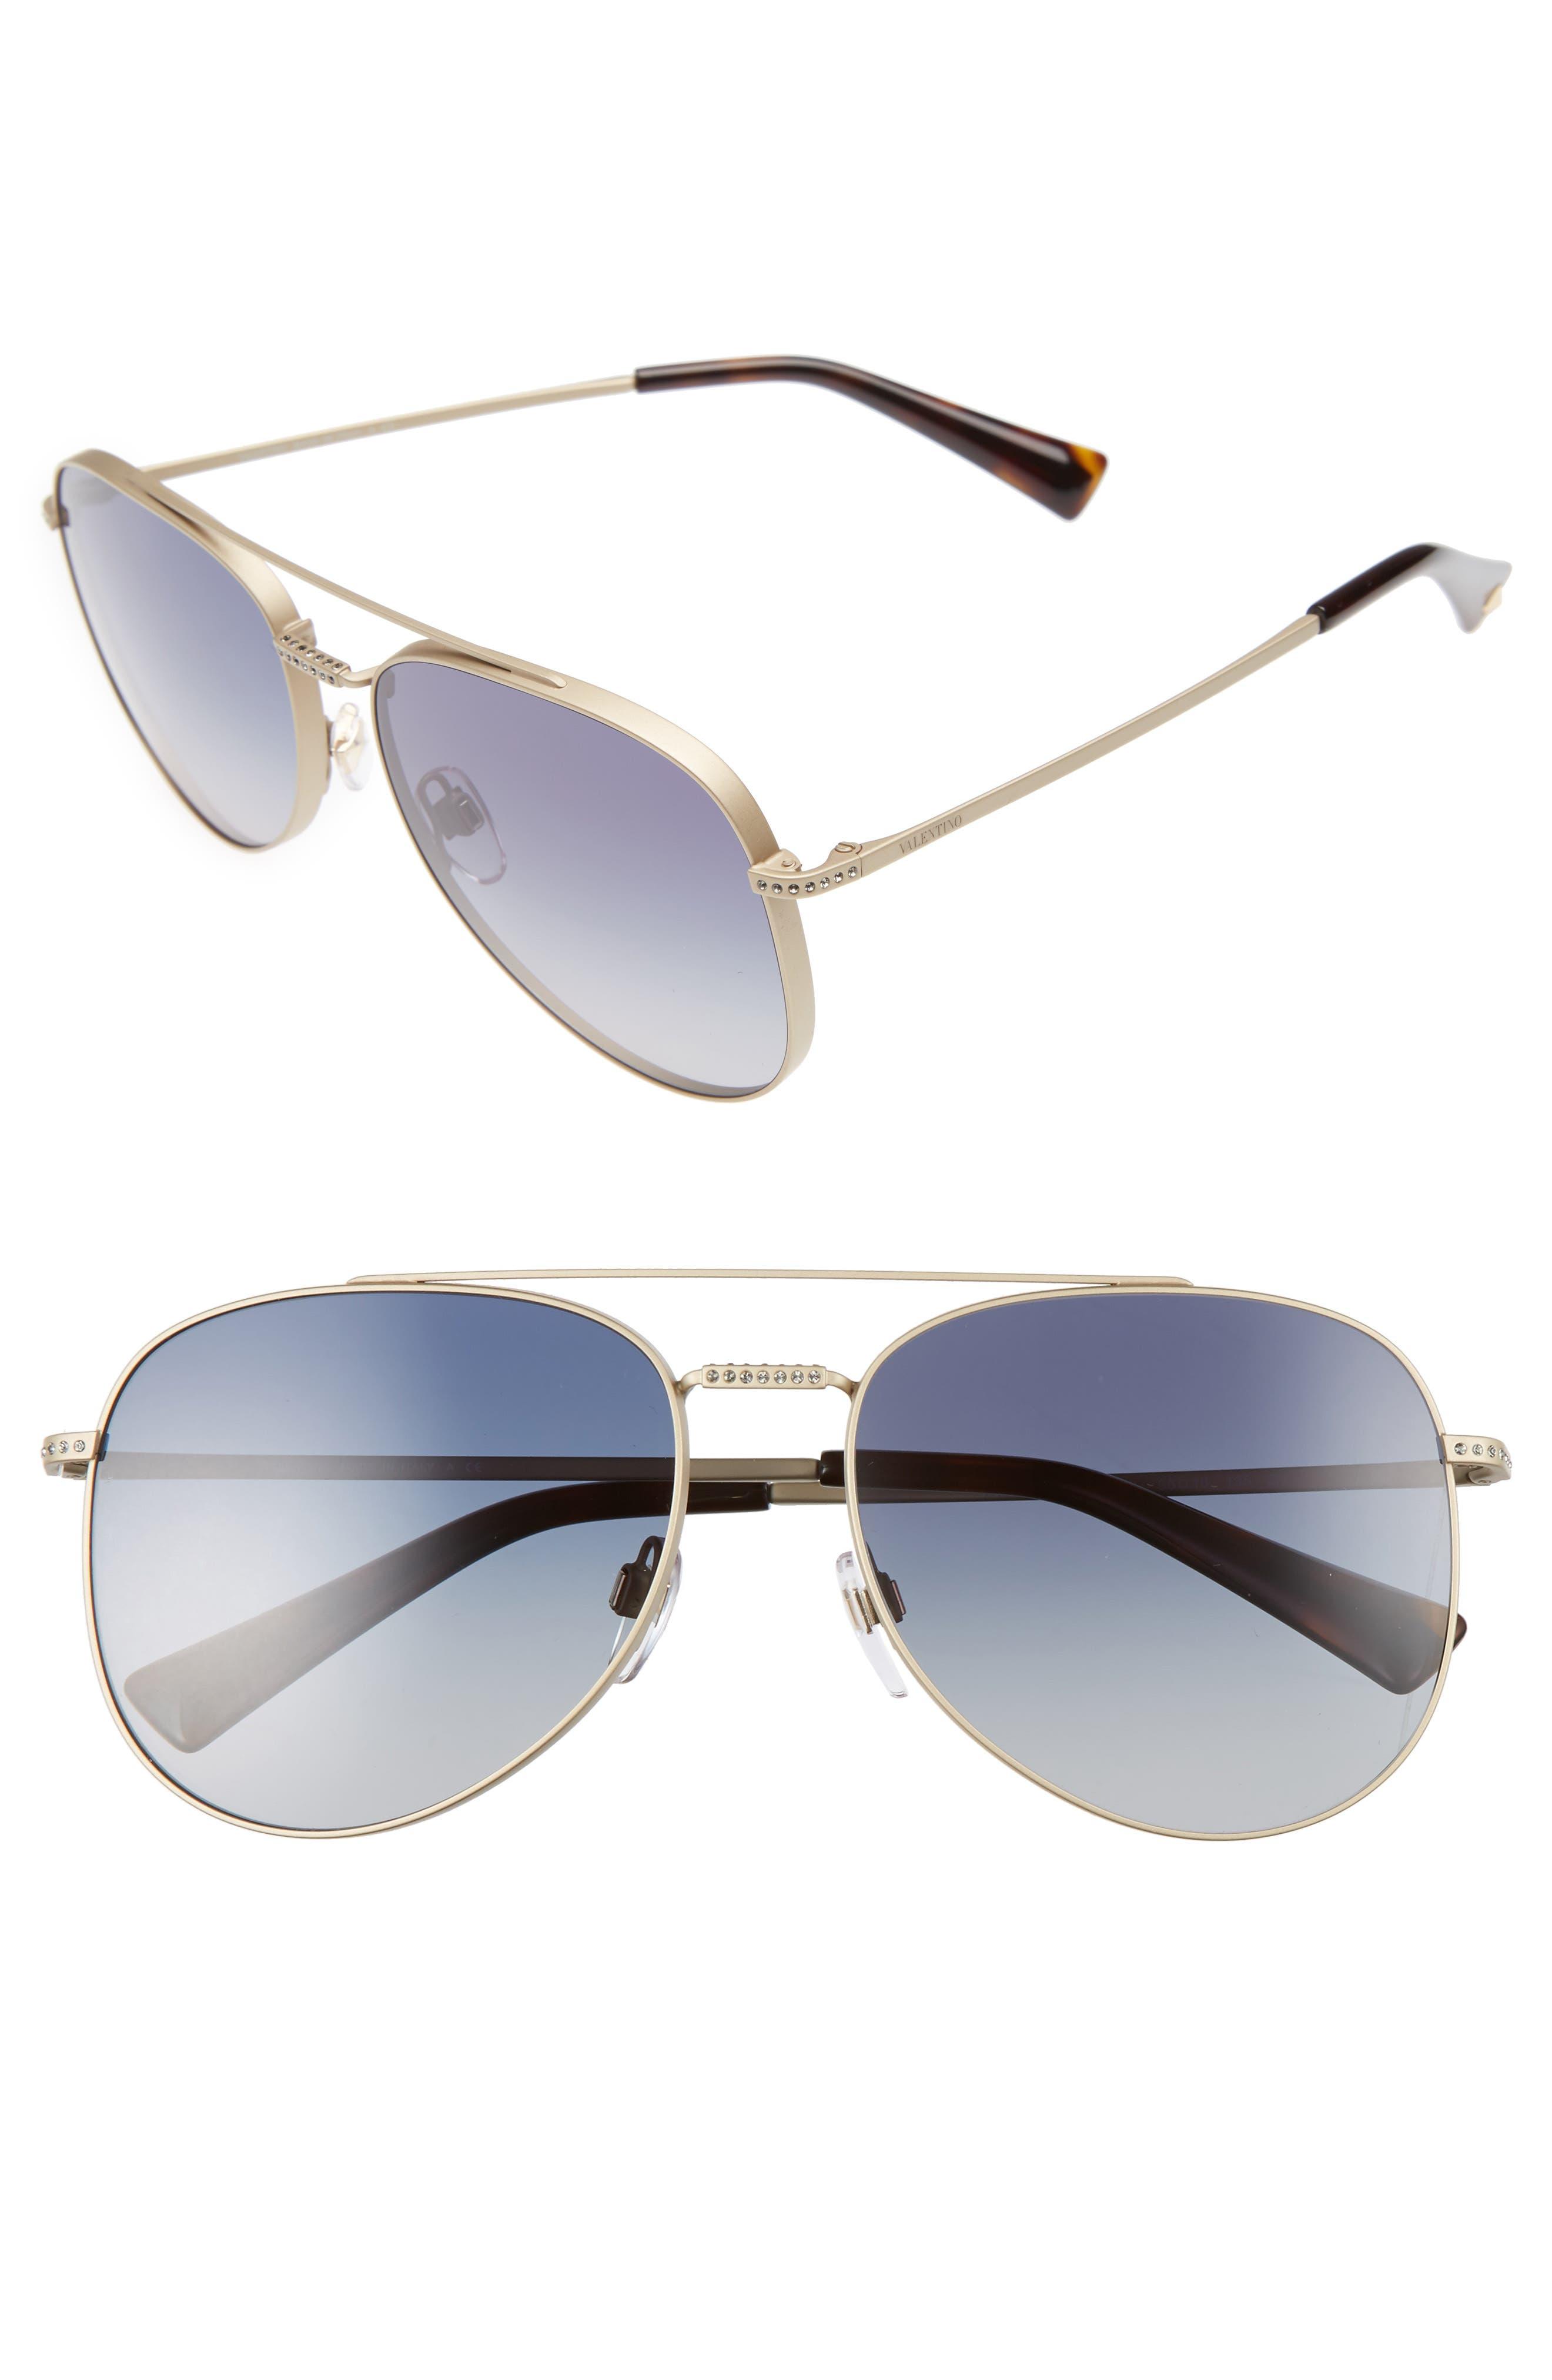 VALENTINO GARAVANI Valentino 56mm Aviator Sunglasses